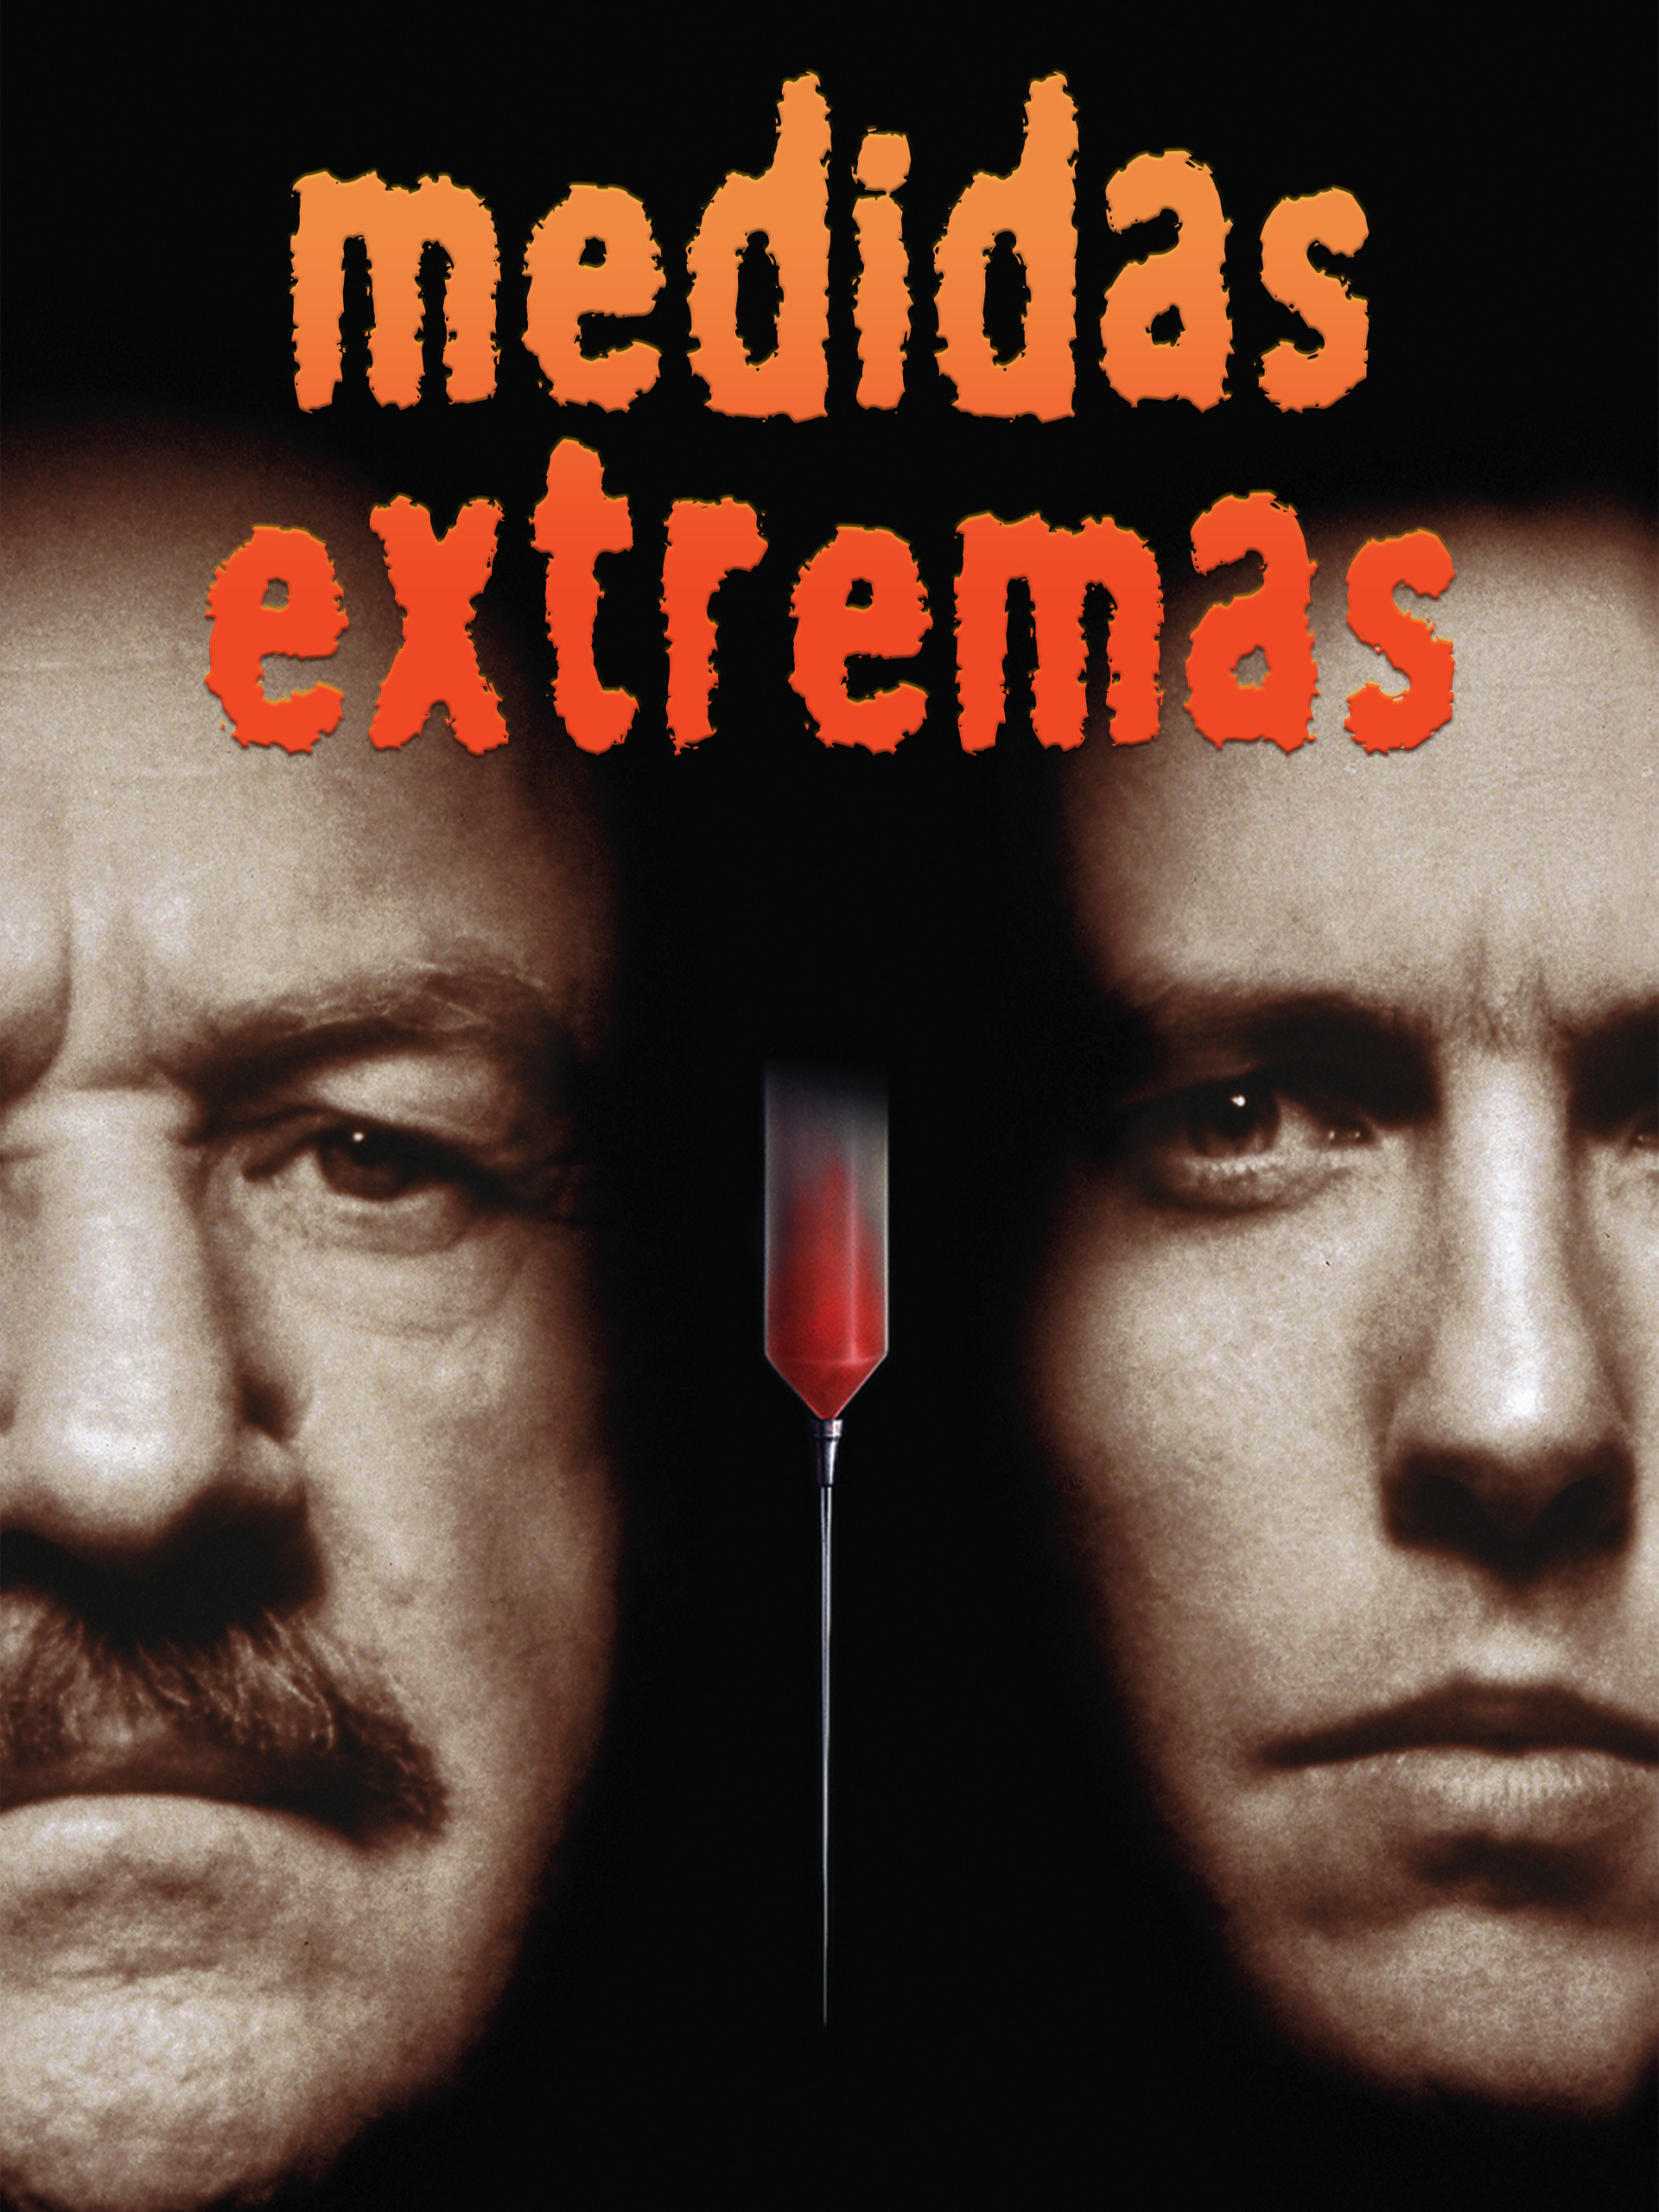 Prime Video: Medidas Extremas